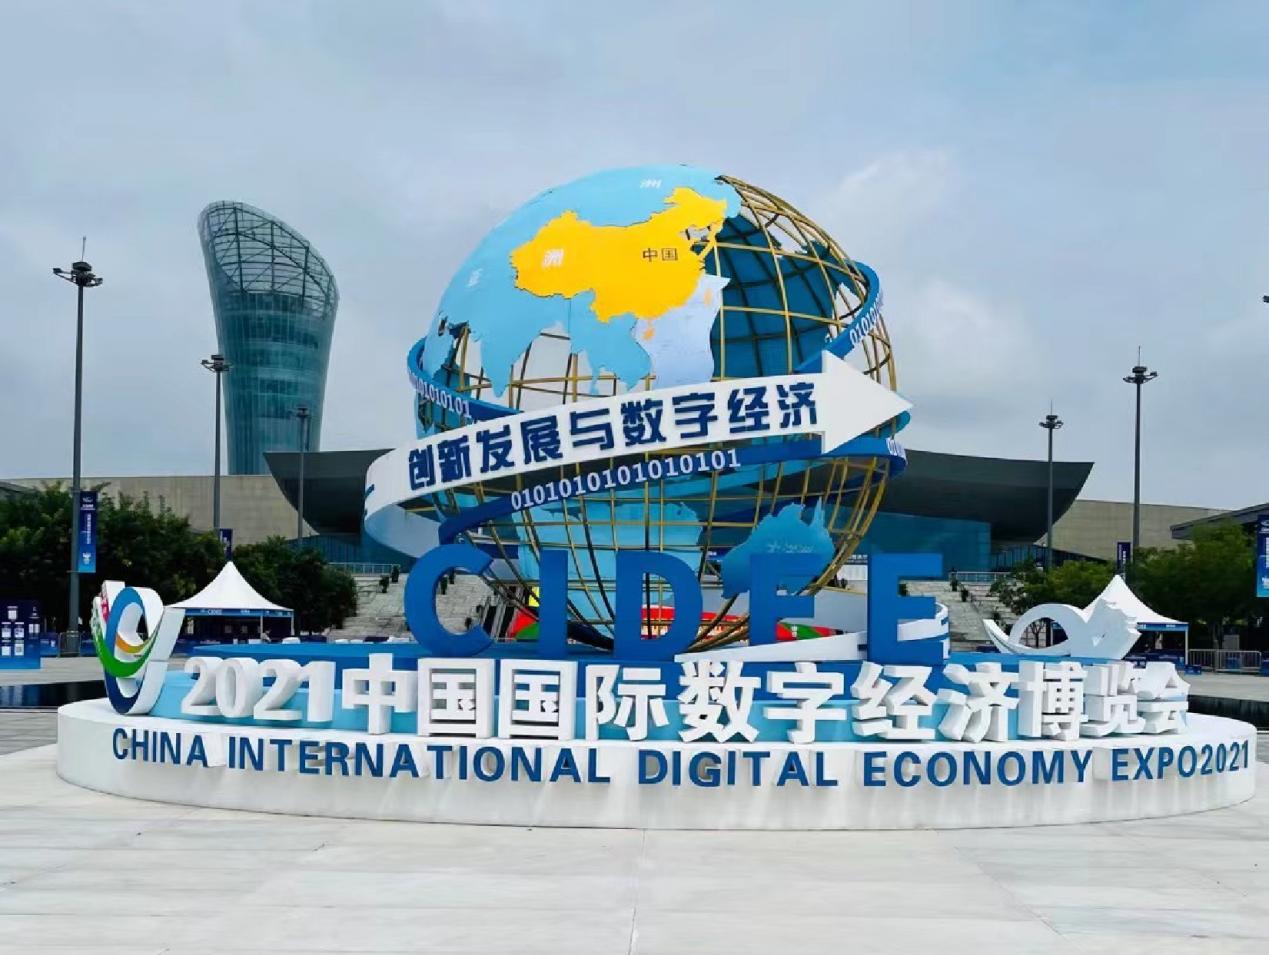 Horion at China International Digital Economic Expo 2021